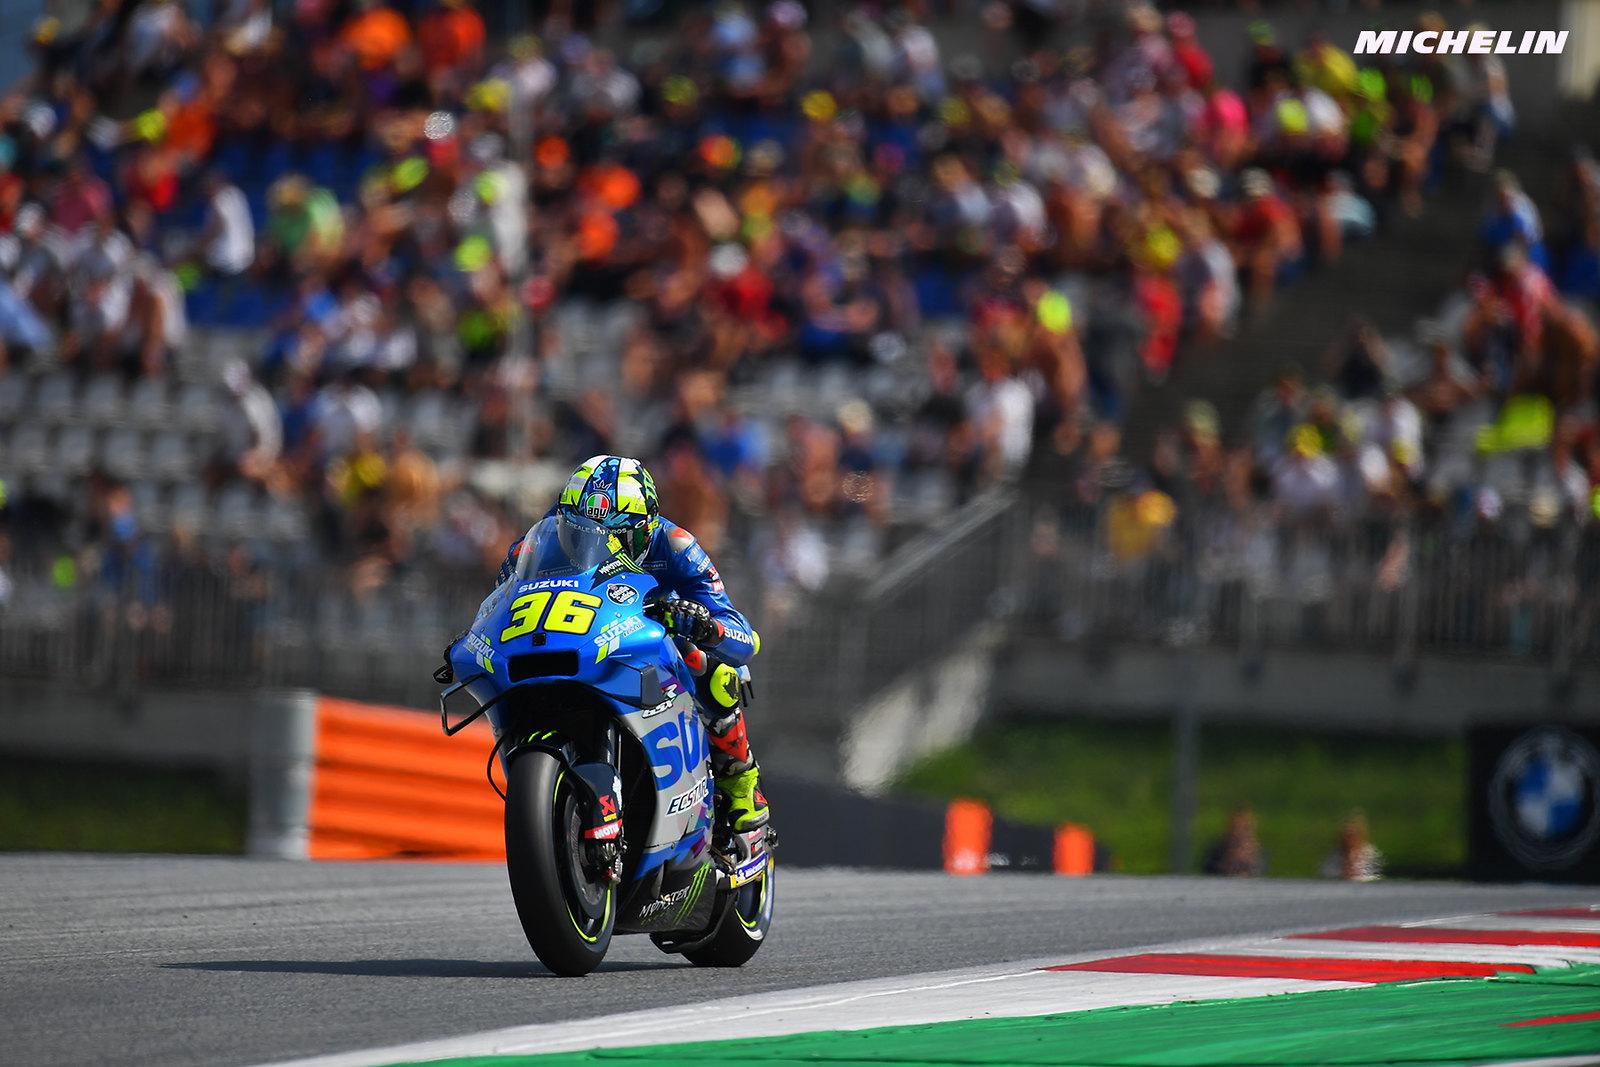 MotoGP2021オーストリアGP予選7位 ジョアン・ミル「暑い状況で少し苦戦した」